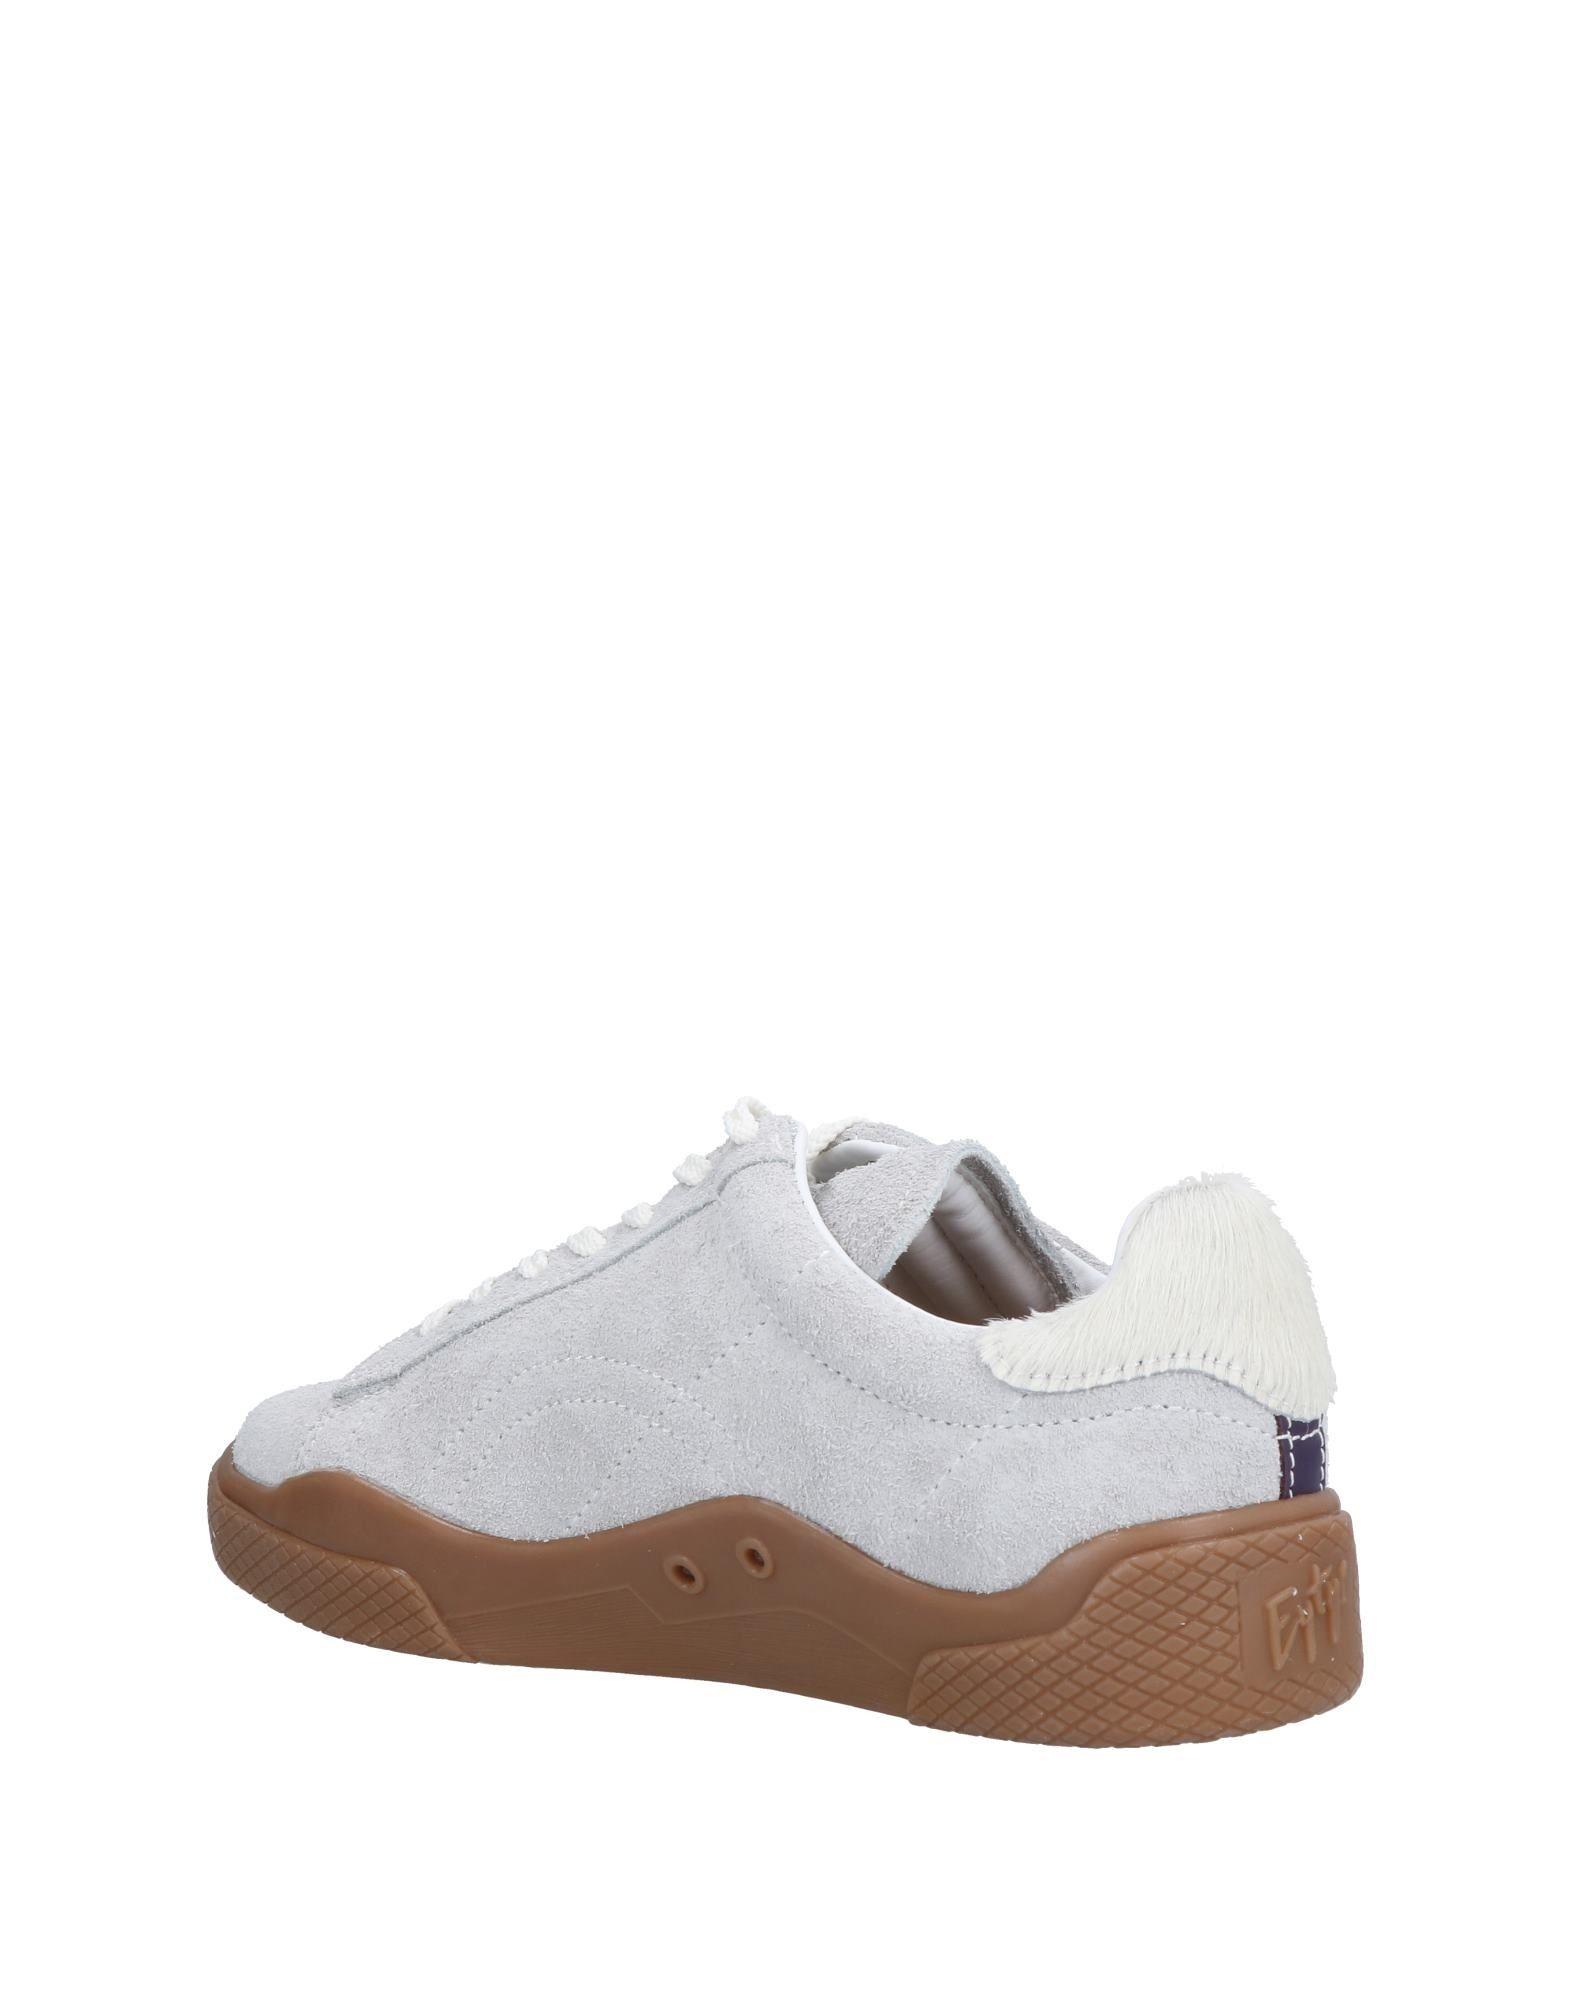 Eytys Sneakers Sneakers Eytys Herren  11493464GJ 2a9909